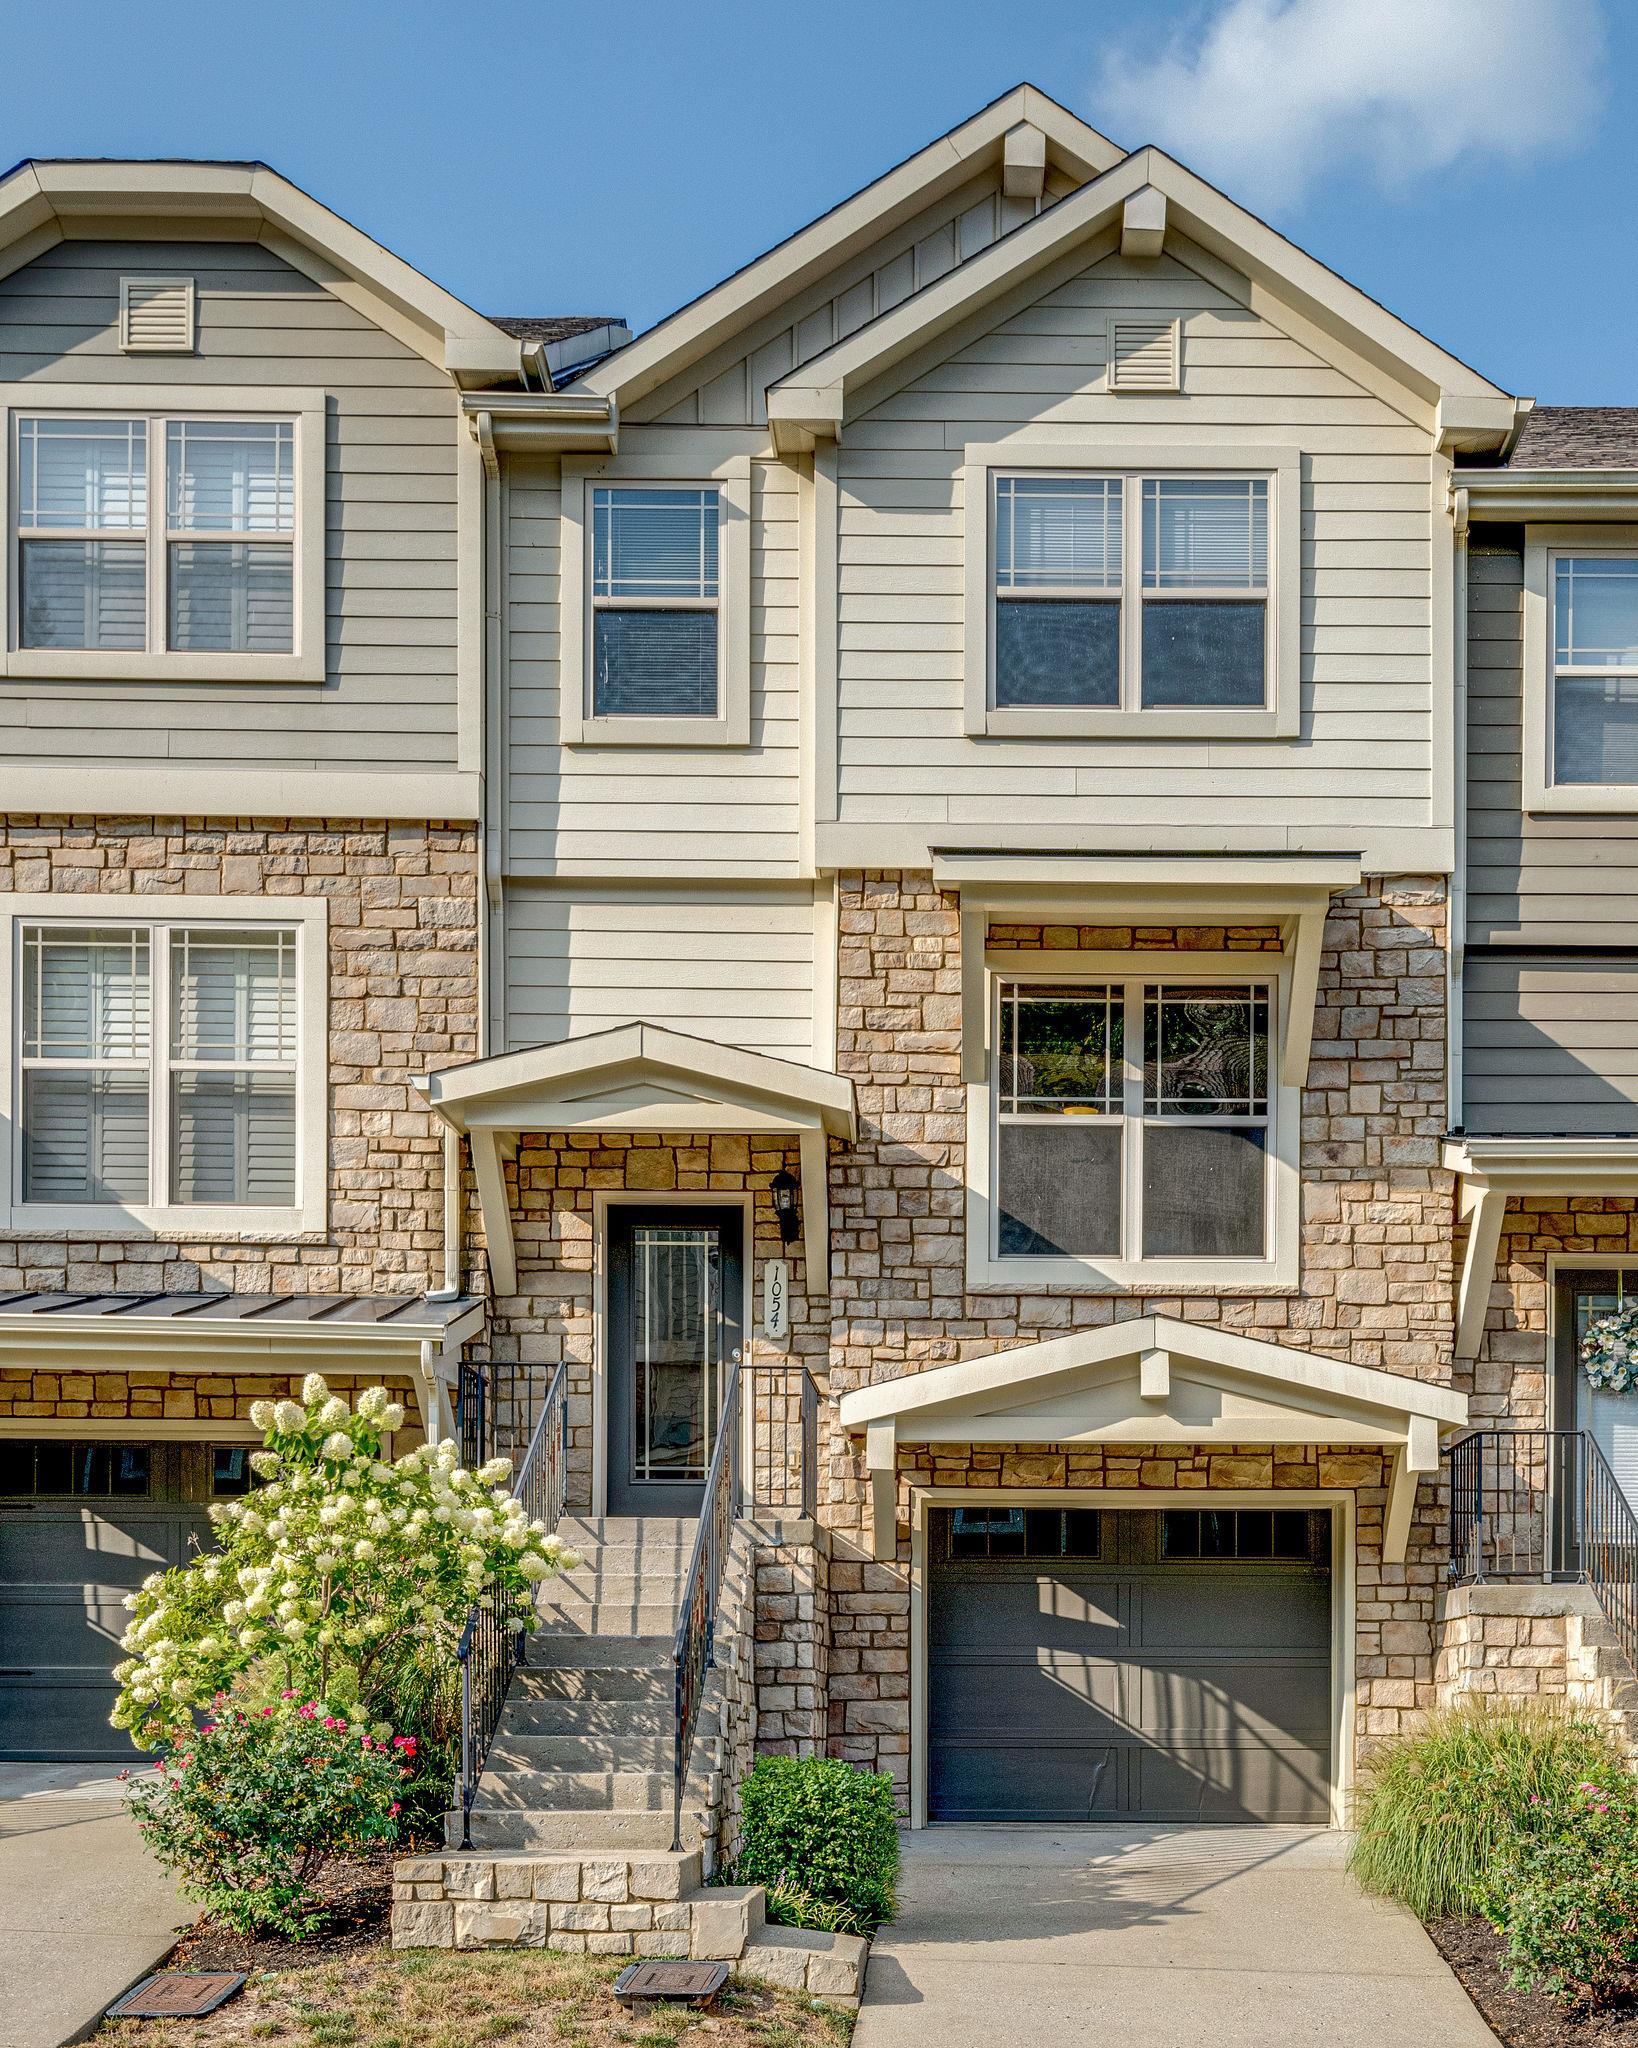 1054 Woodbury Falls Dr, Nashville, TN 37221 - Nashville, TN real estate listing